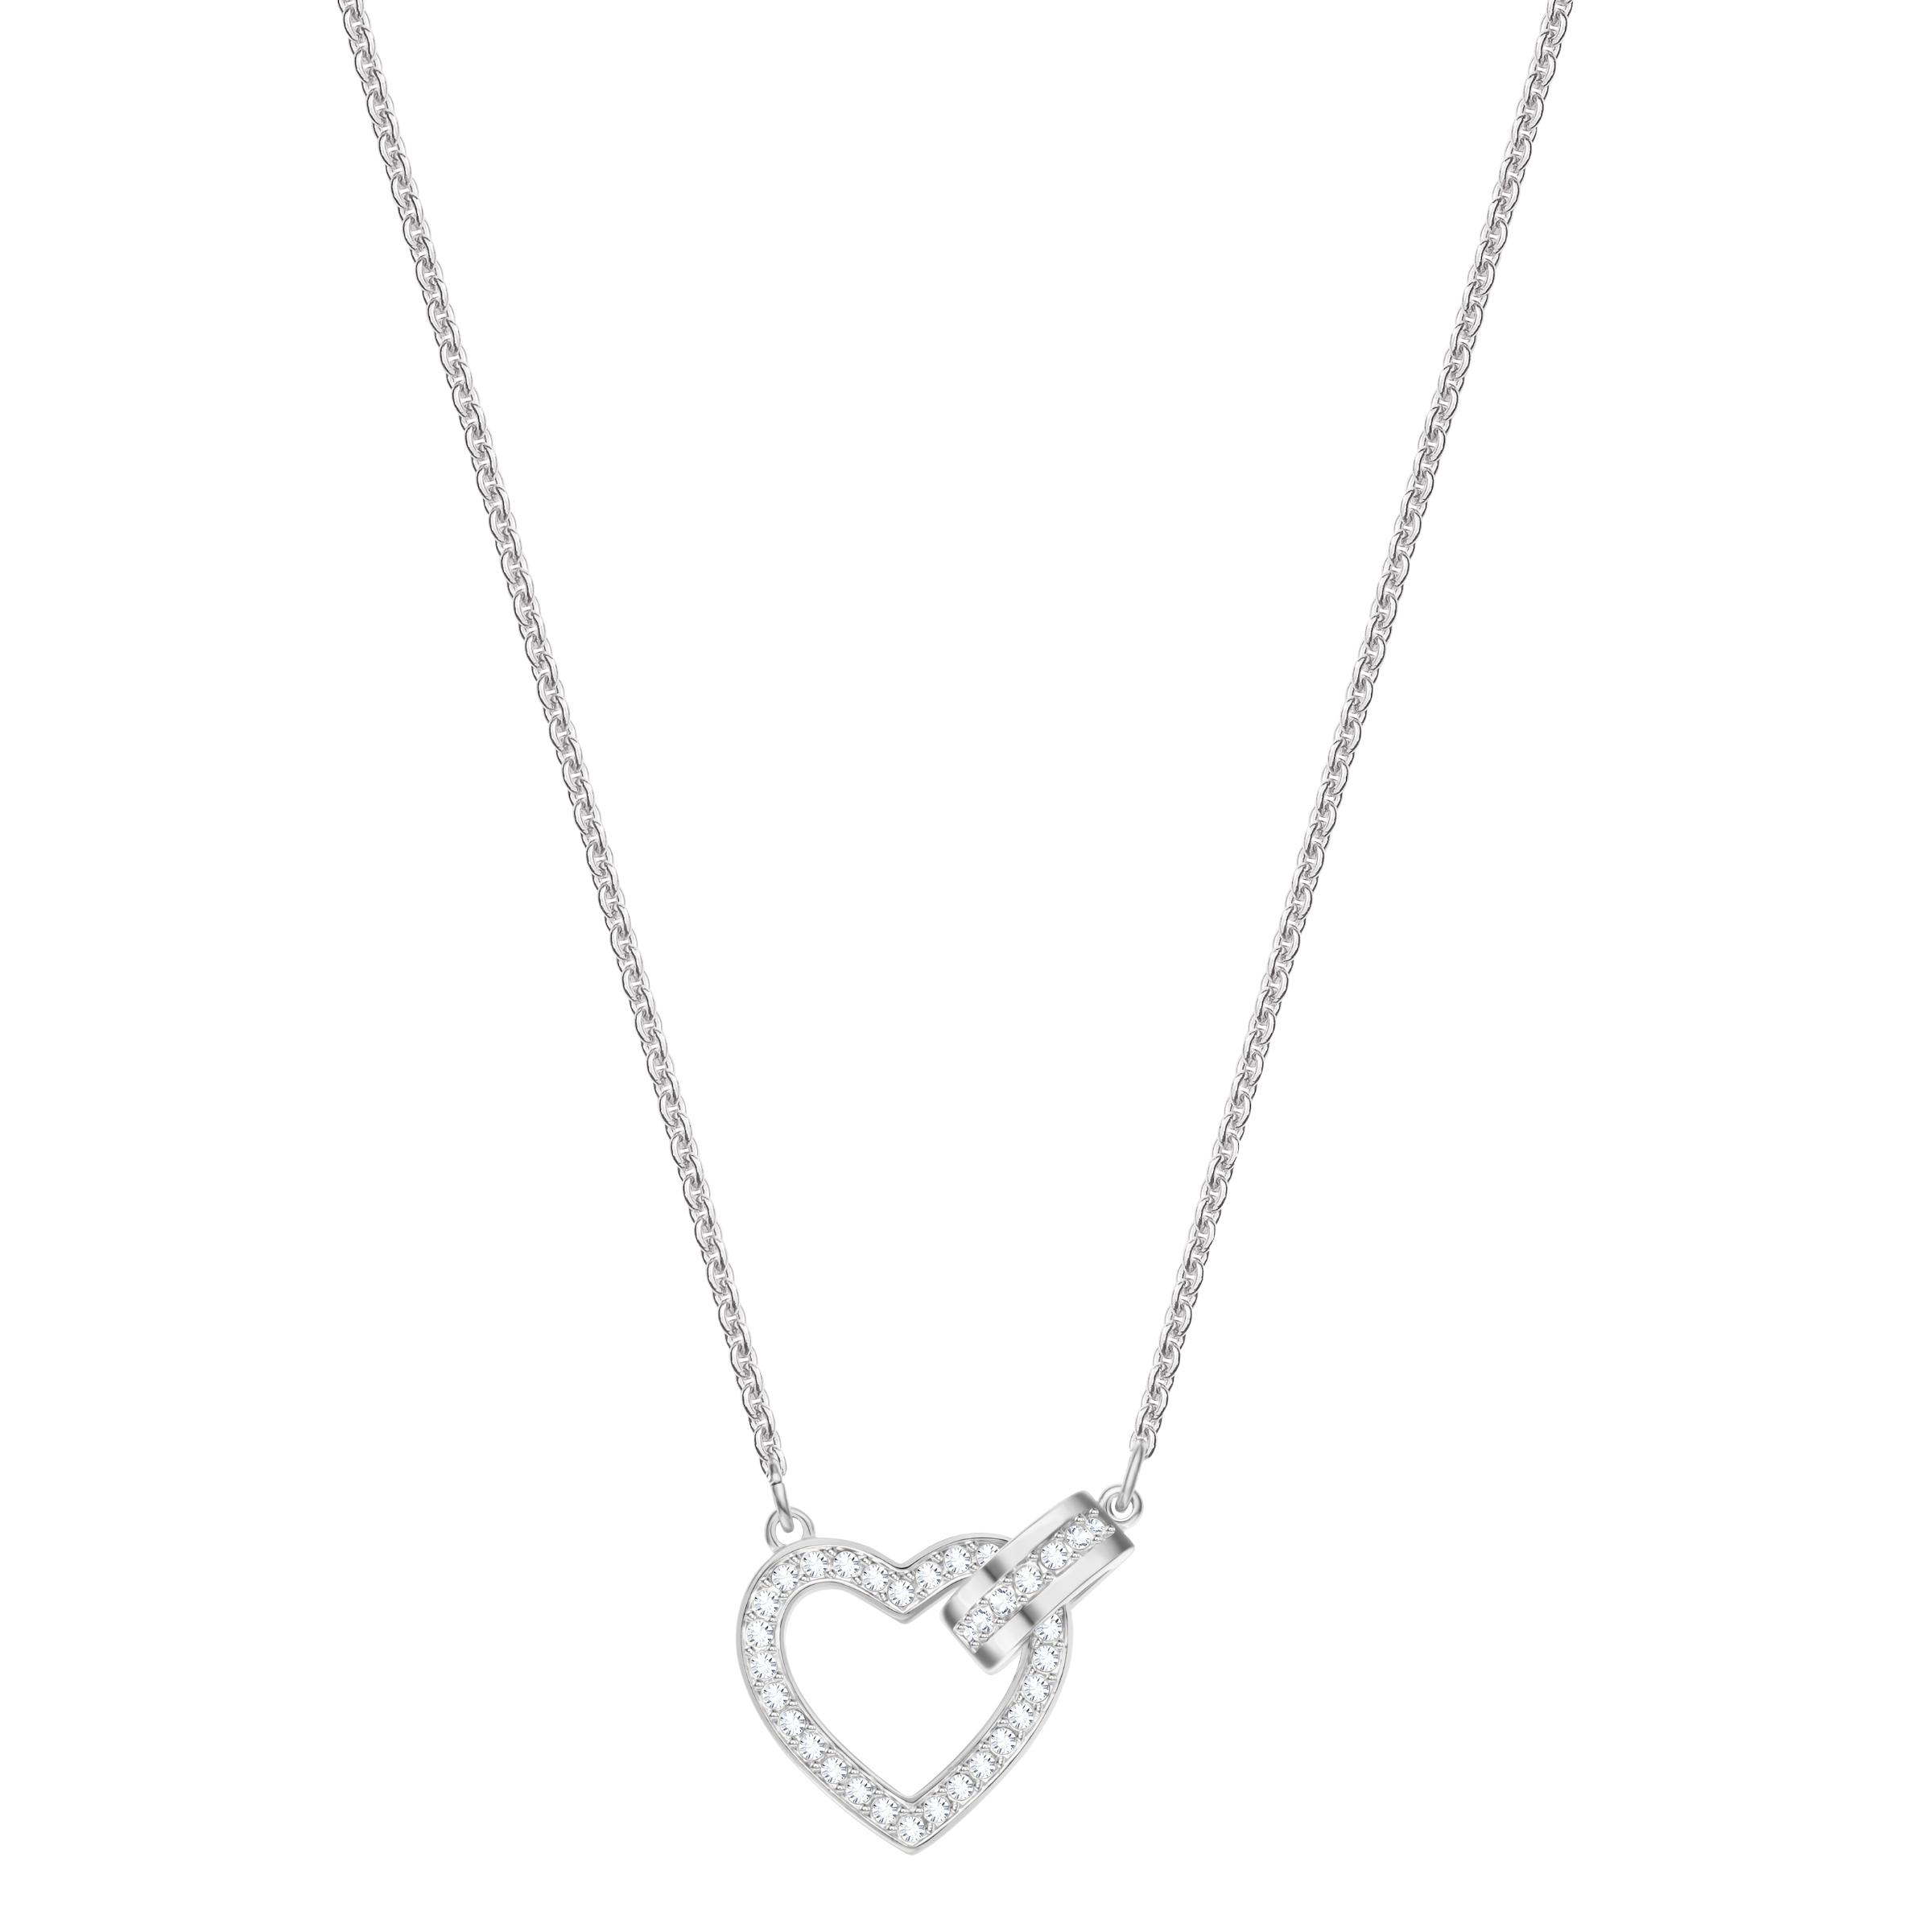 Lovely Necklace, White, Rhodium Plating